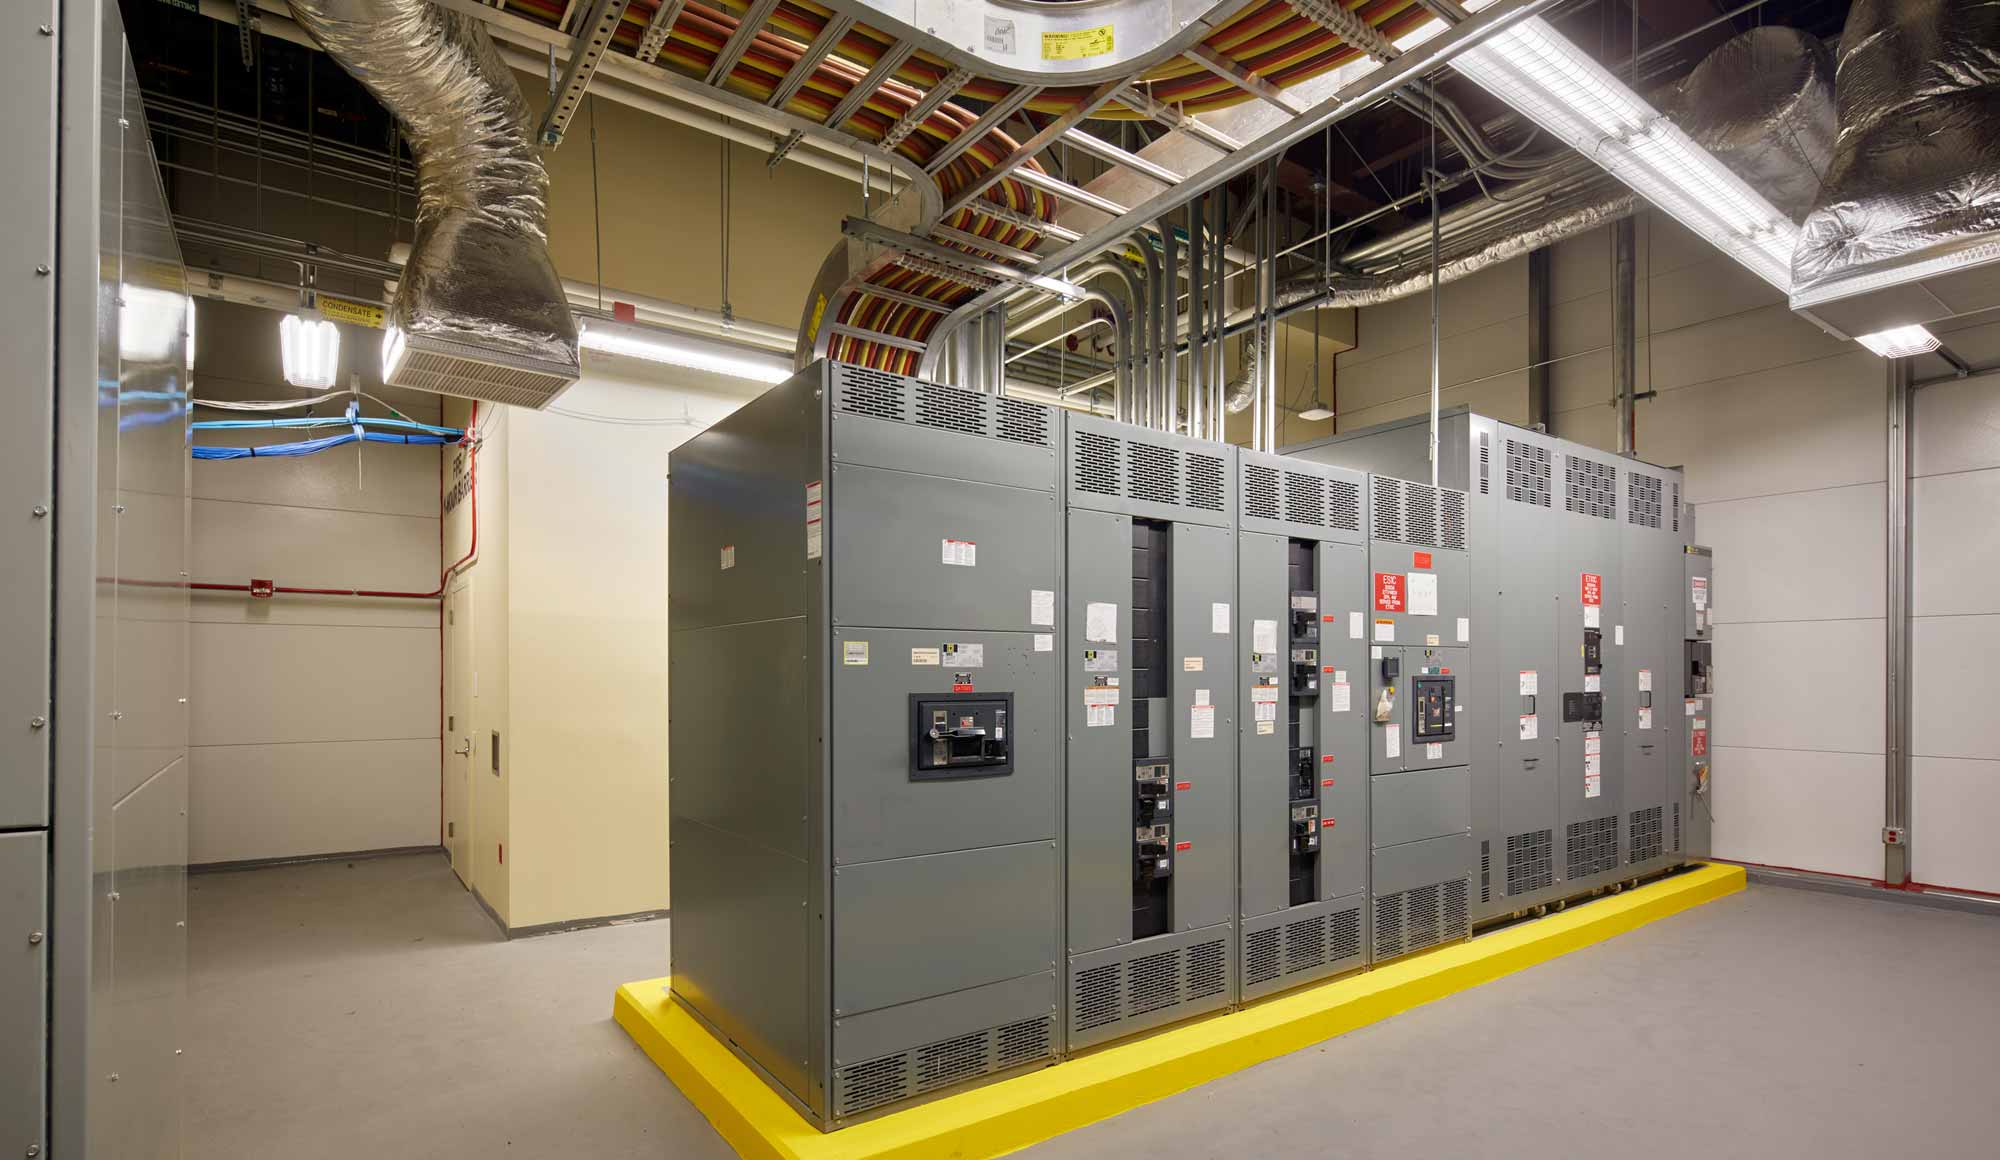 Kaiser Redwood City Hospital Central Utility Plant